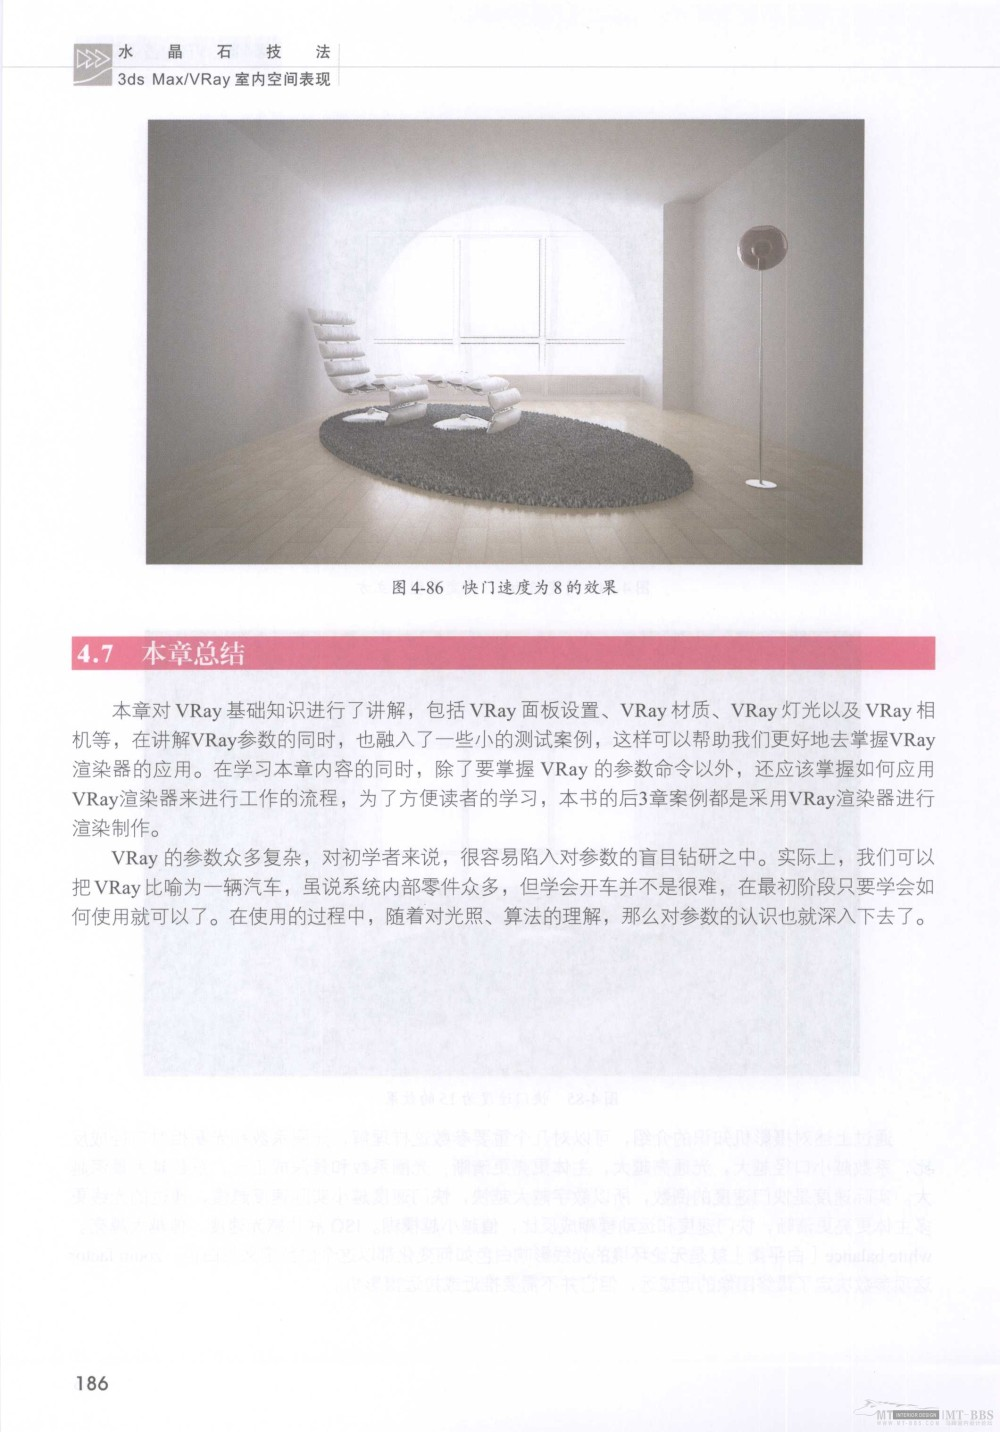 水晶石技法-3ds_Max&VRay室内空间表现_水晶石技法-3ds_Max&VRay室内空间表现_页面_192.jpg